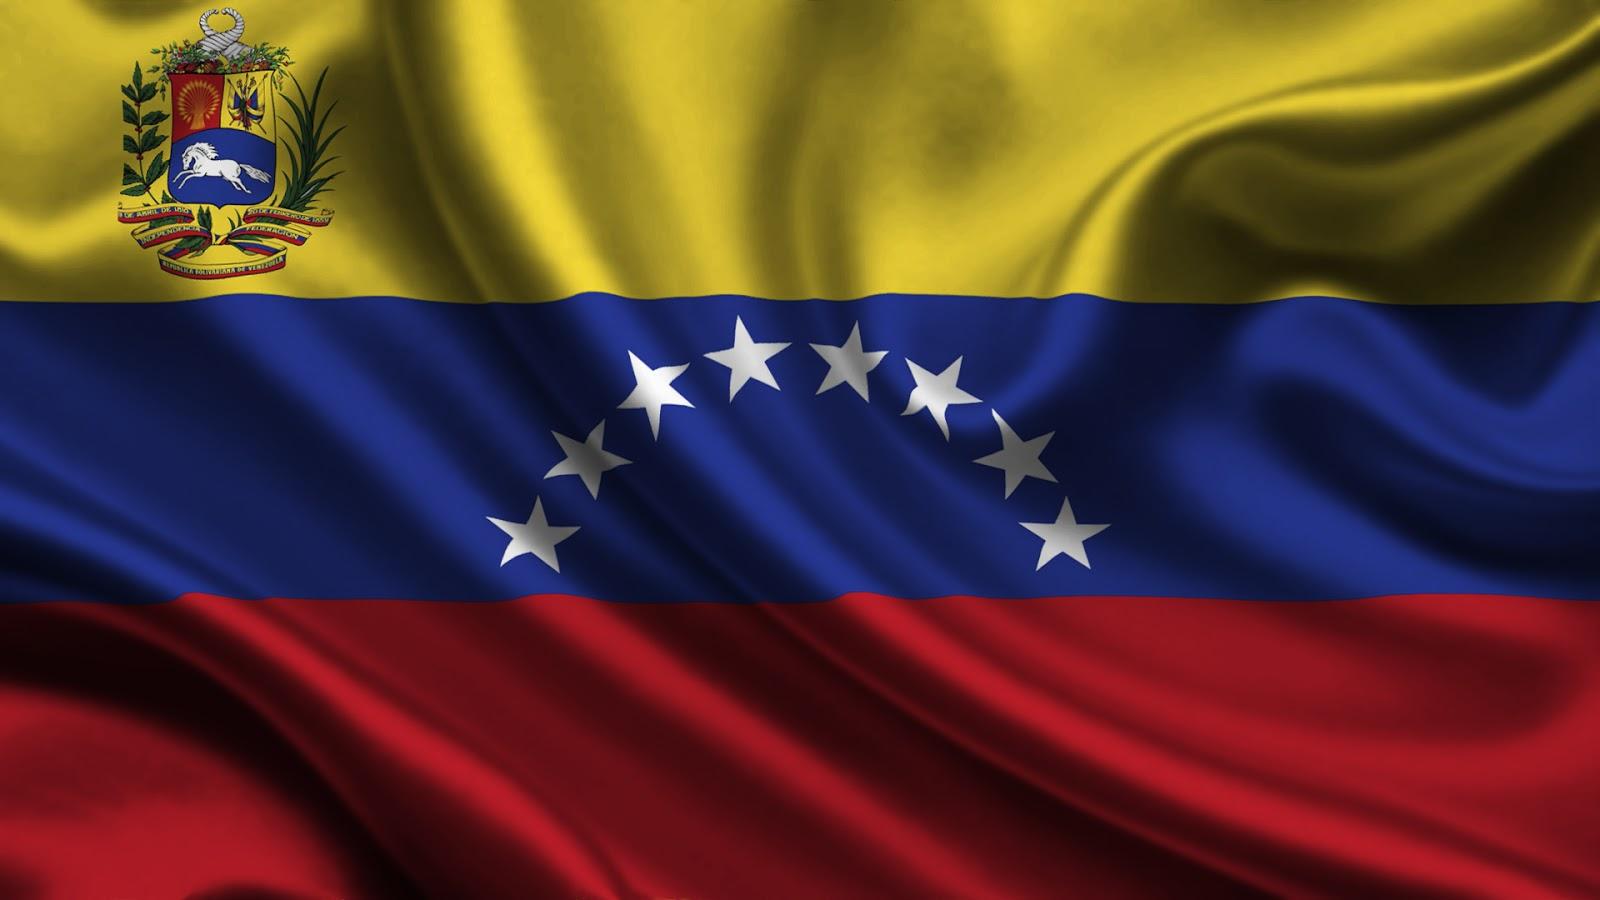 http://4.bp.blogspot.com/-clTTyMbF6Is/UPtFnI6fvzI/AAAAAAAA0hM/JoRHfyZLaTM/s1600/Bandera-de-Venezuela_Fondos-de-Pantalla-de-Banderas.jpg